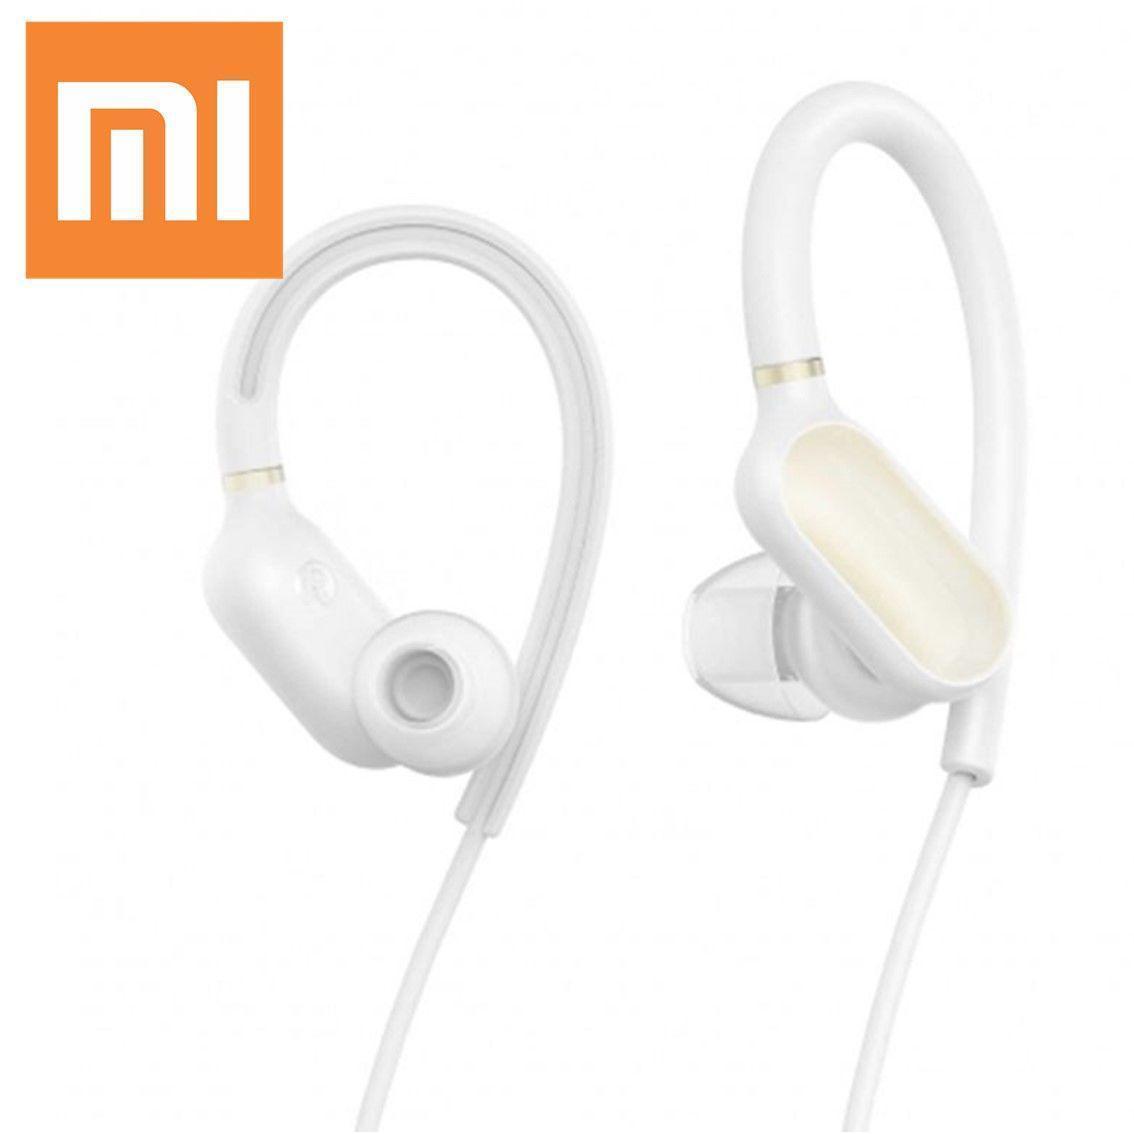 Беспроводные наушники Xiaomi Sports Bluetooth Headset Mini YDLYEJO3ML White белый Гарантия!